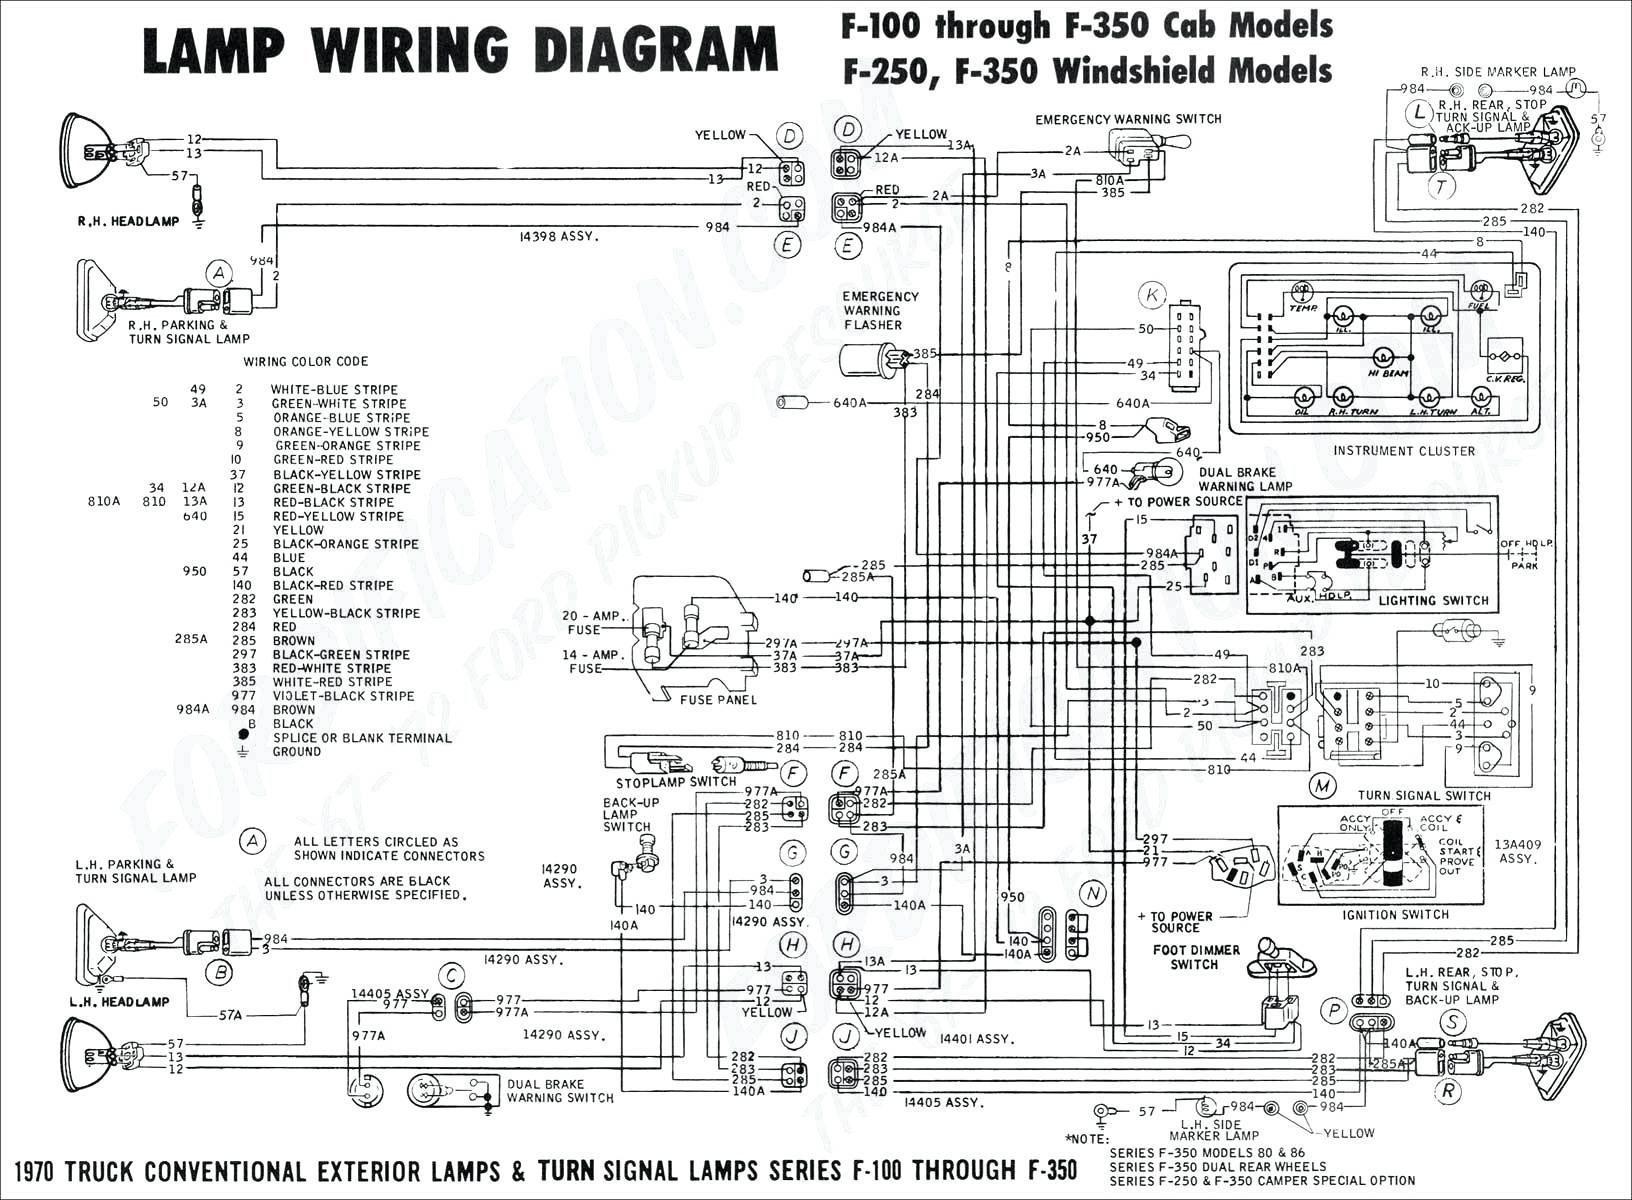 Porsche Boxster Engine Diagram Porsche 997 Fuse Diagram Wiring Diagram Datasource Of Porsche Boxster Engine Diagram